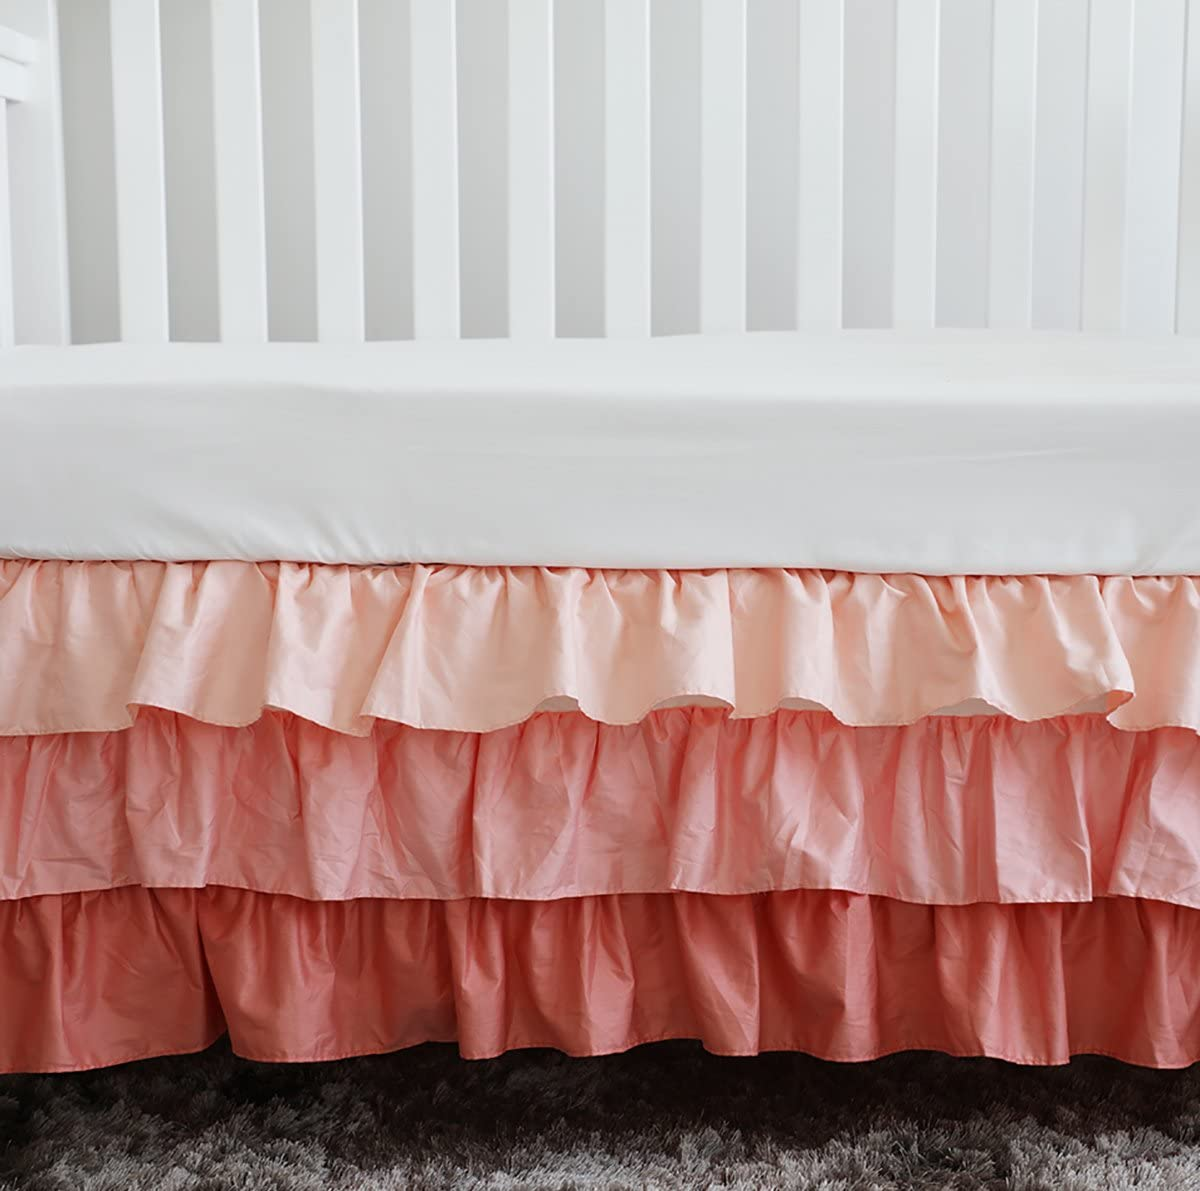 Sahaler Peach Coral 3 Tiered Ruffled Crib Skirt Baby Girl Nursery Bedding Dust Ruffle (Coral)